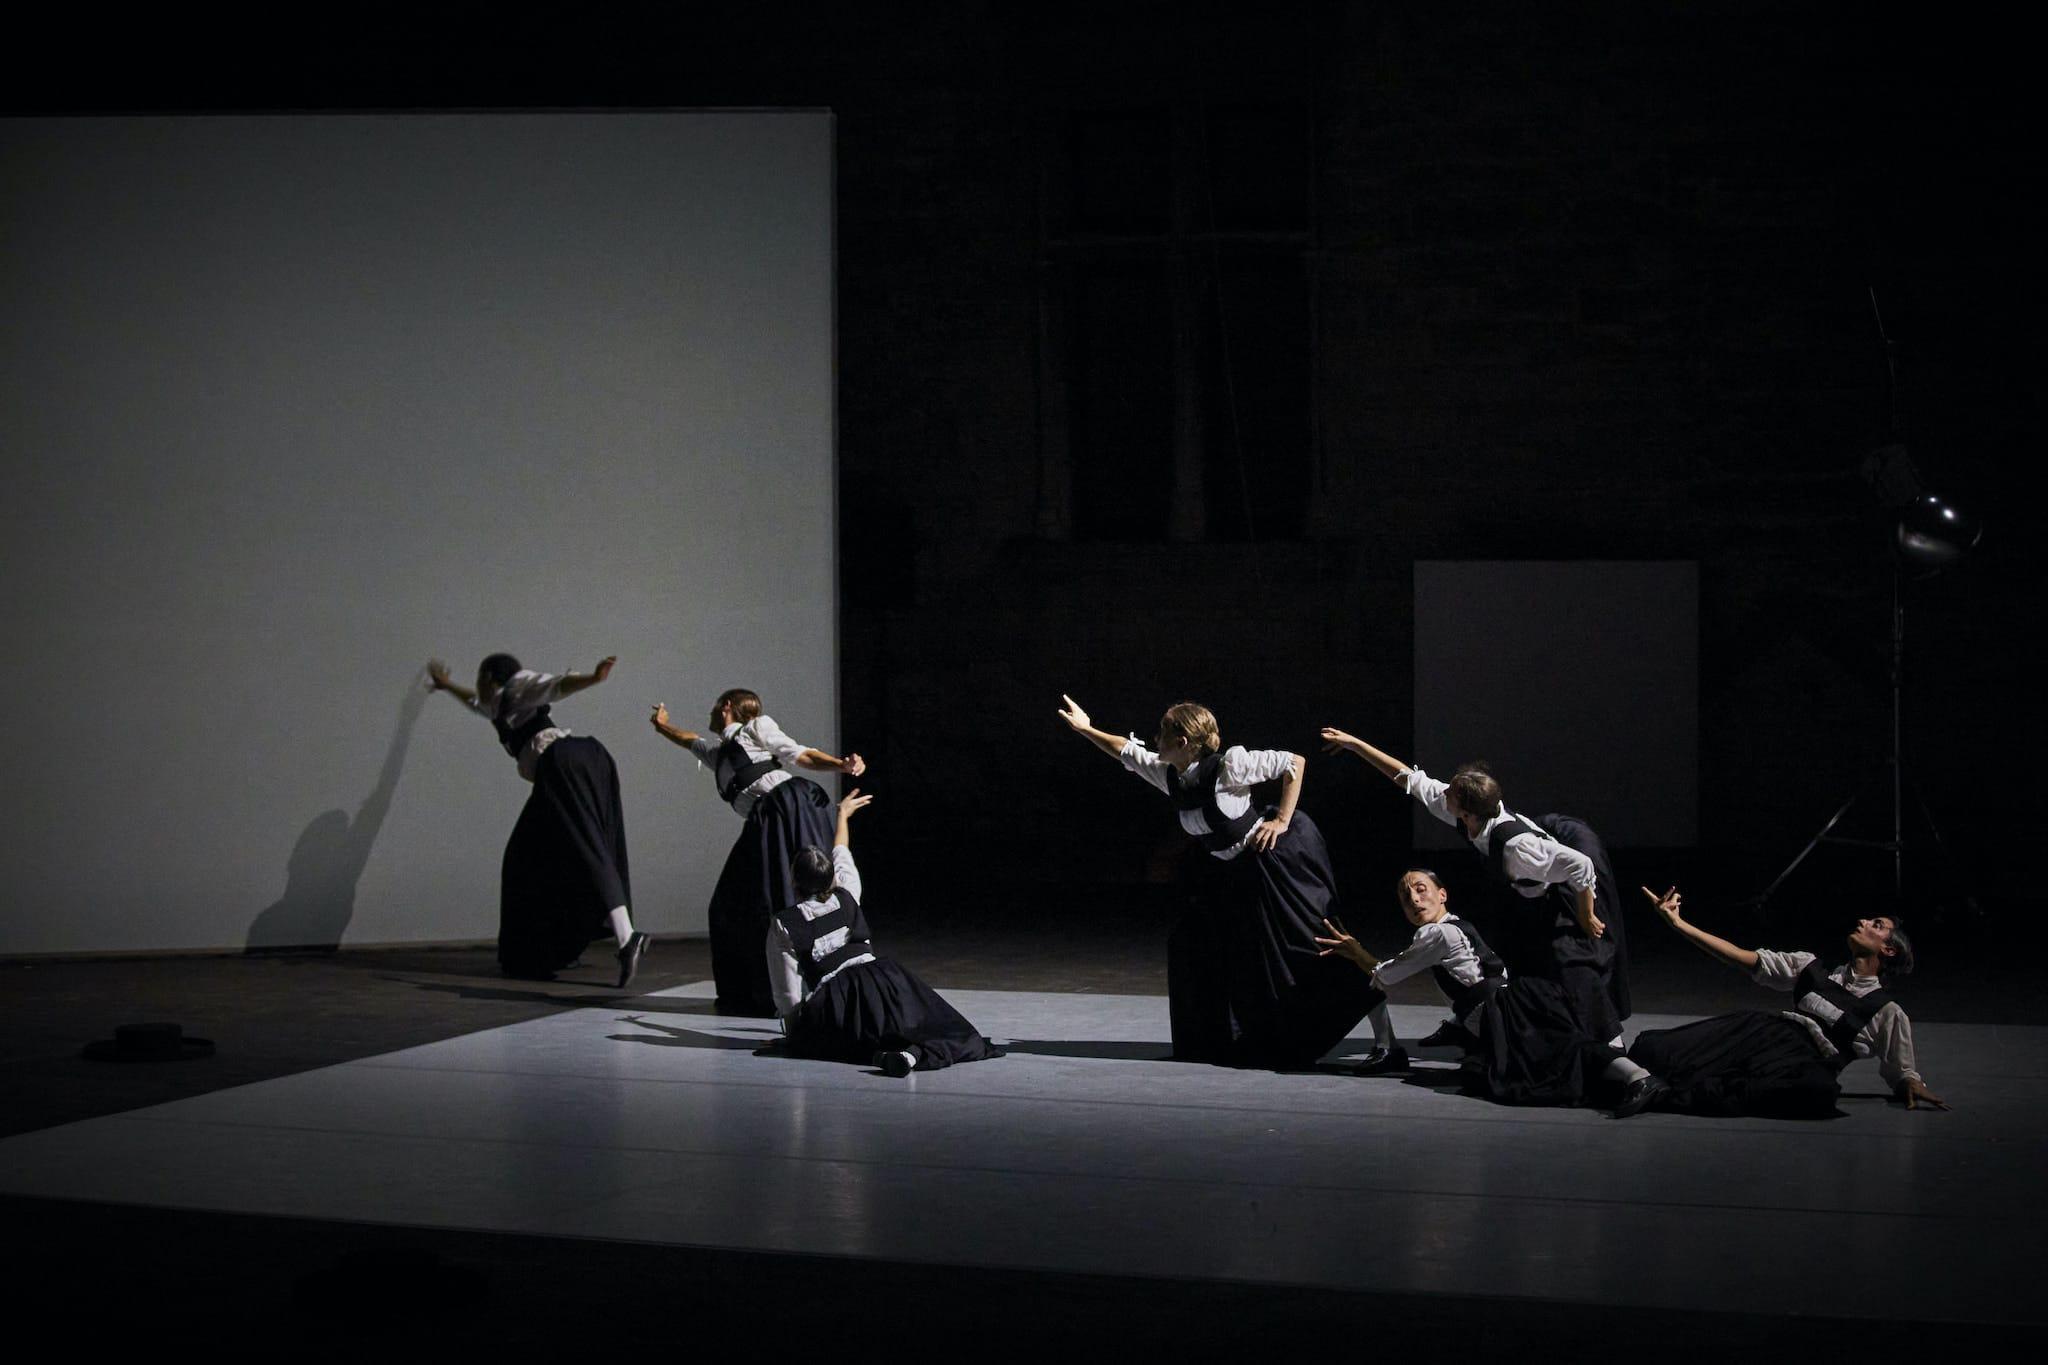 Sonoma de Marcos Morau photo danse